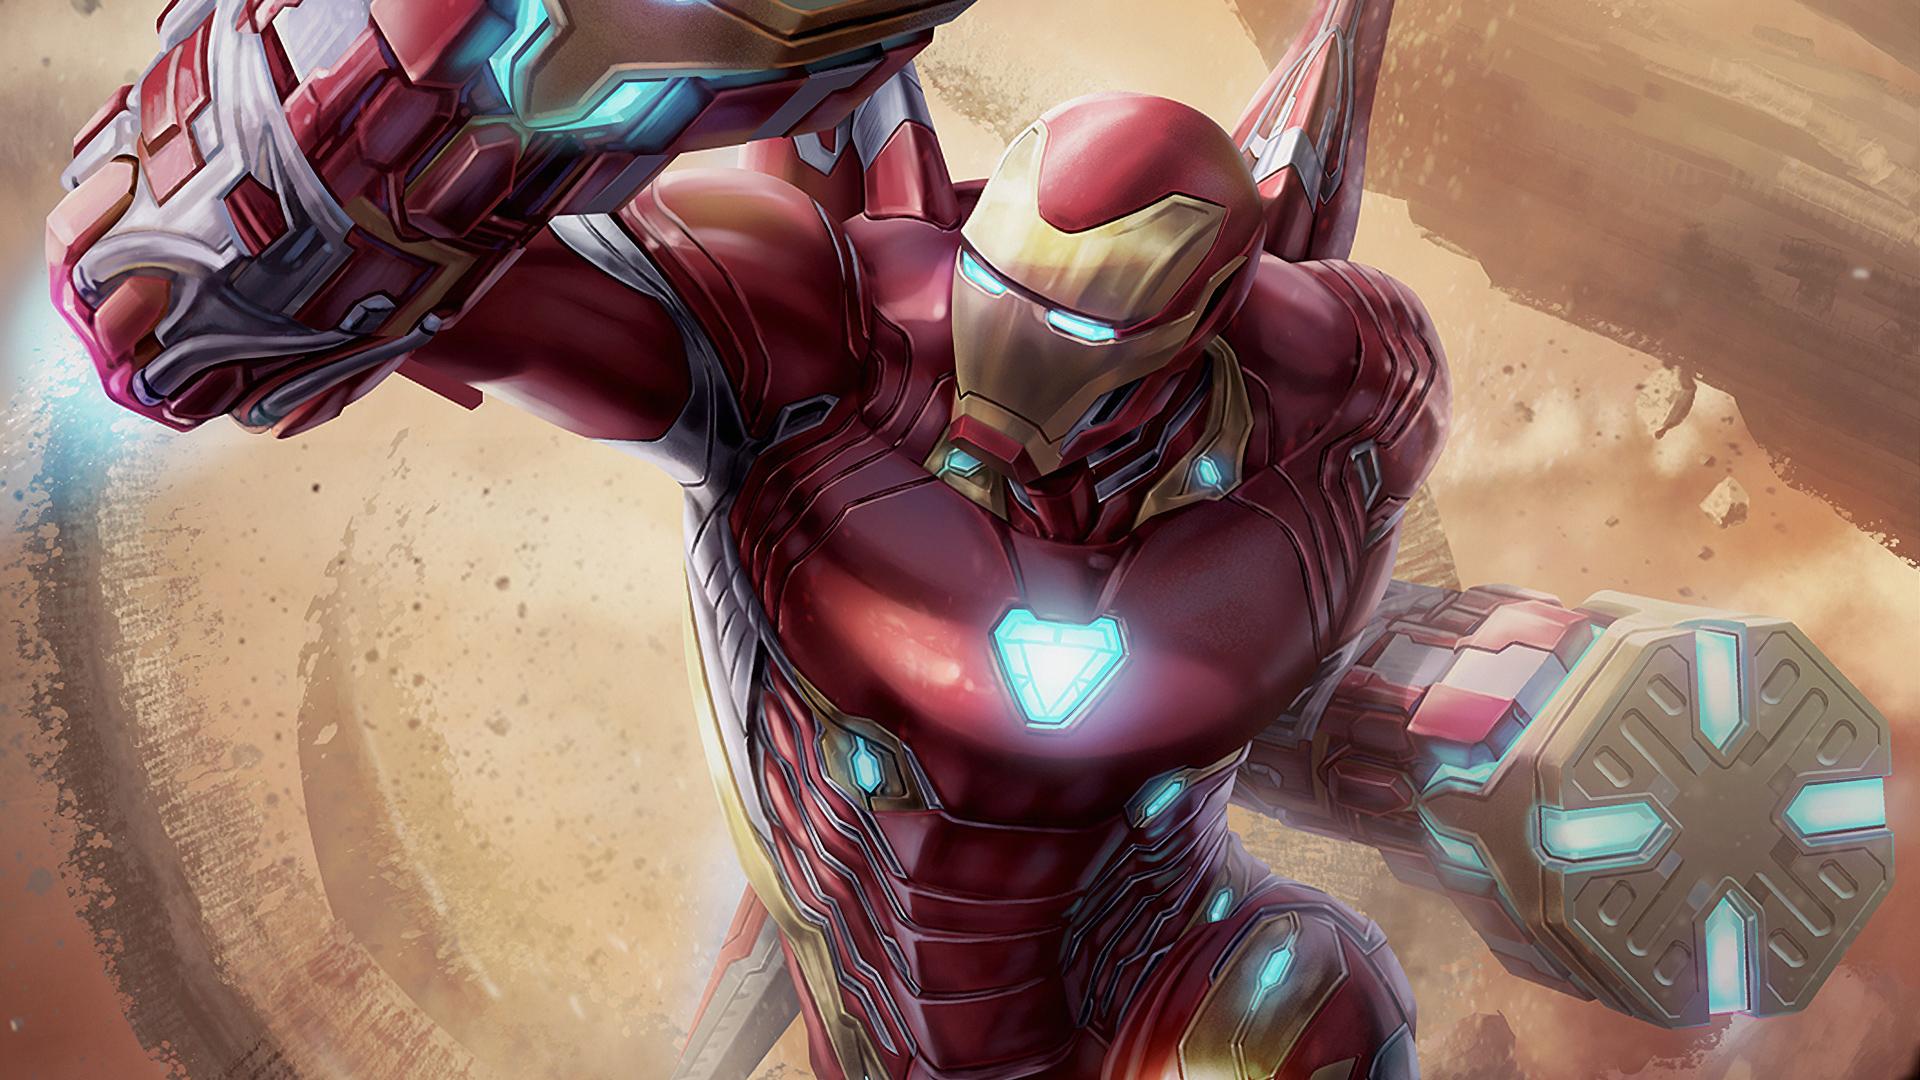 1920x1080 Iron Man Suit In Avengers Laptop Full Hd 1080p Hd